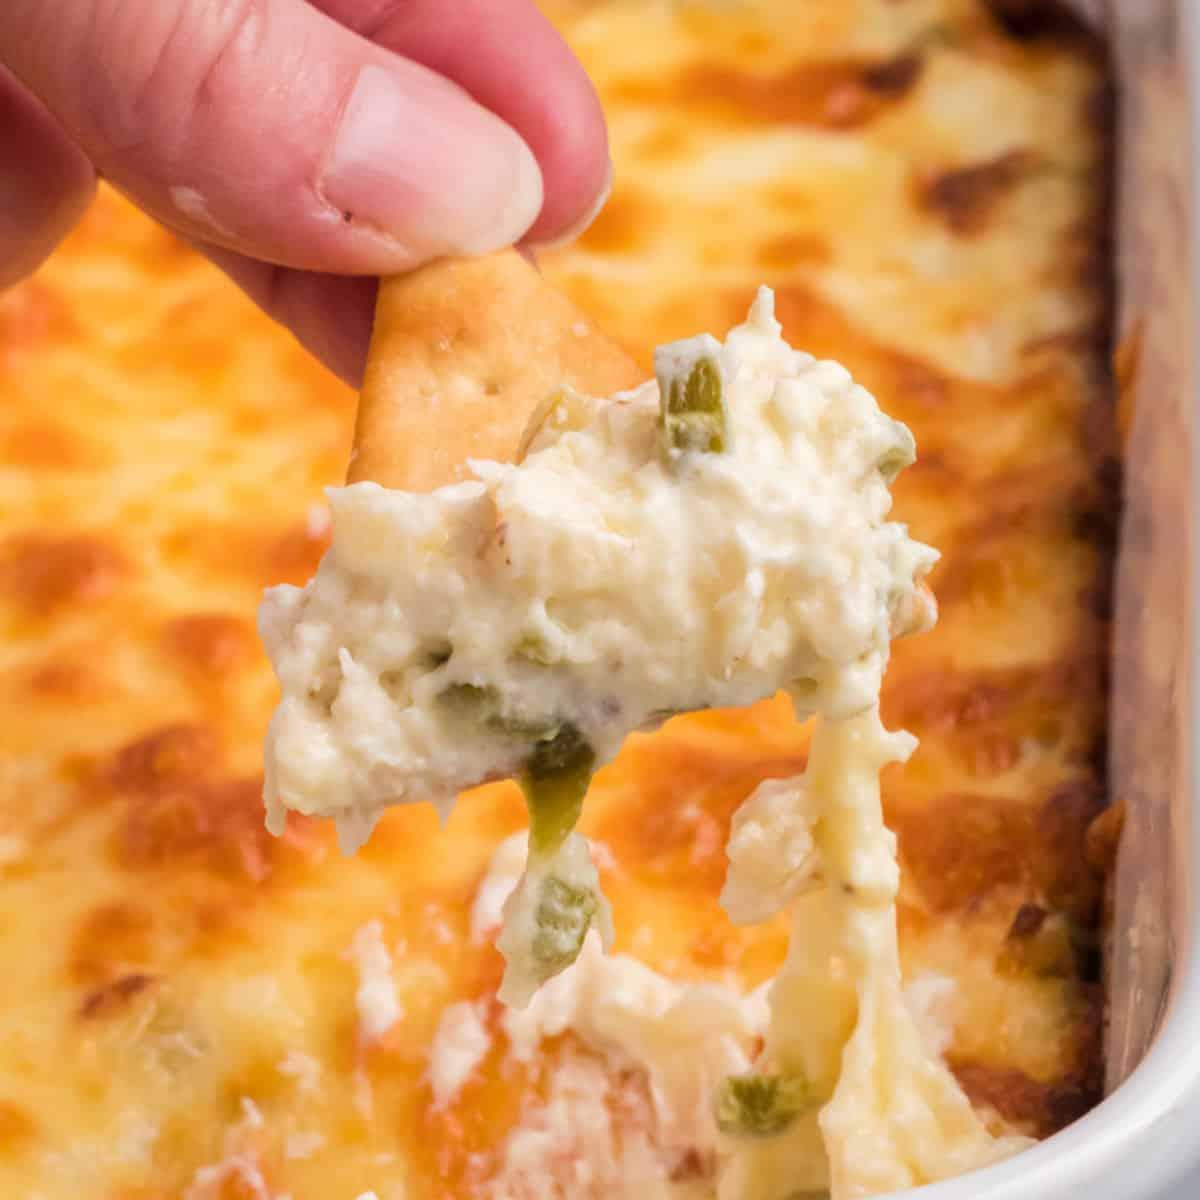 square image of a pita chip dipped into jalapeno crab dip